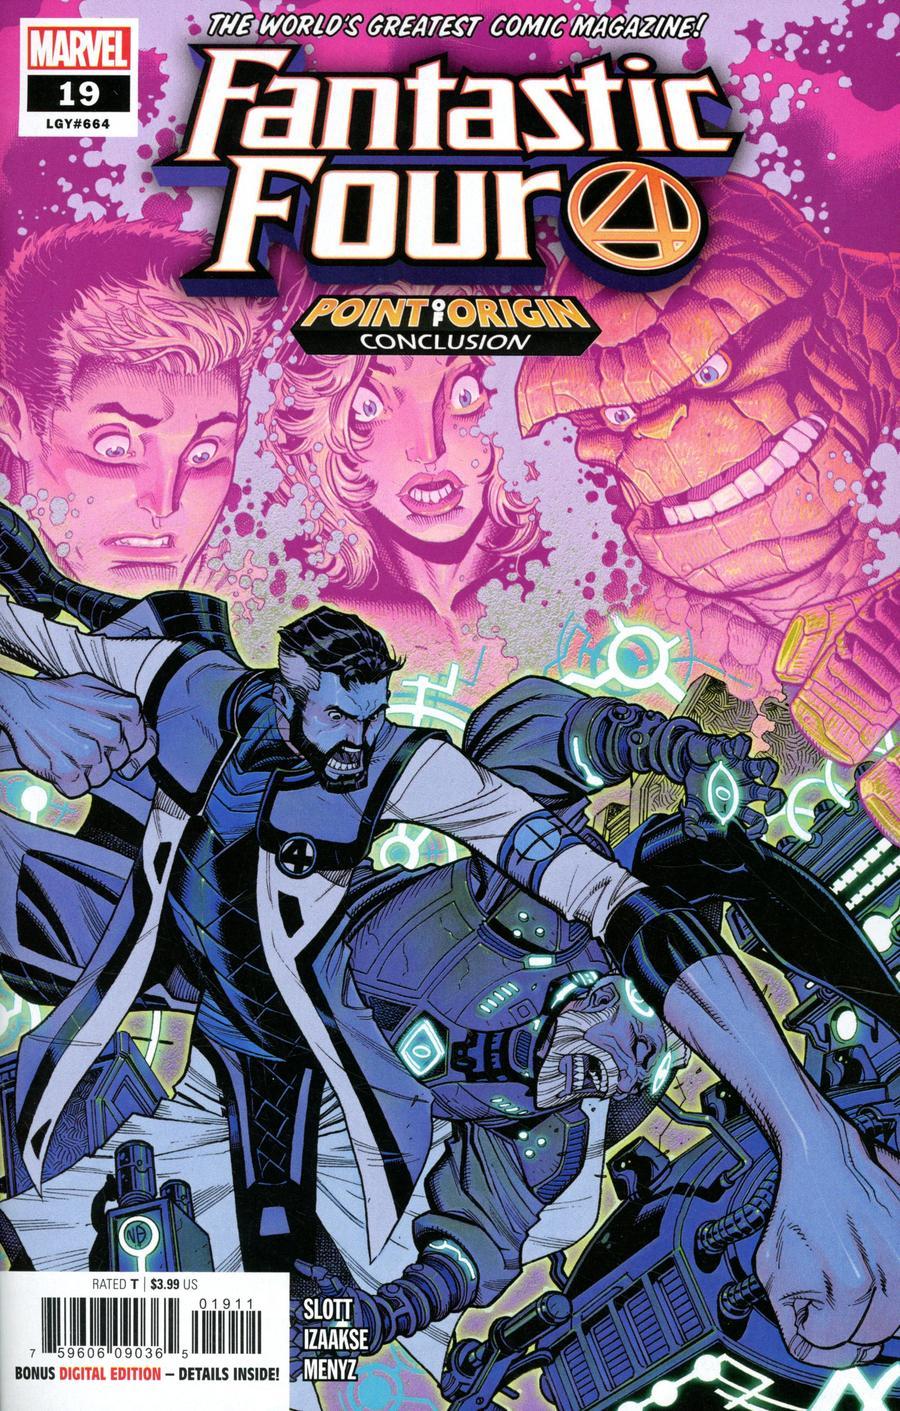 Fantastic Four Vol 6 #19 Cover A Regular Nick Bradshaw Cover